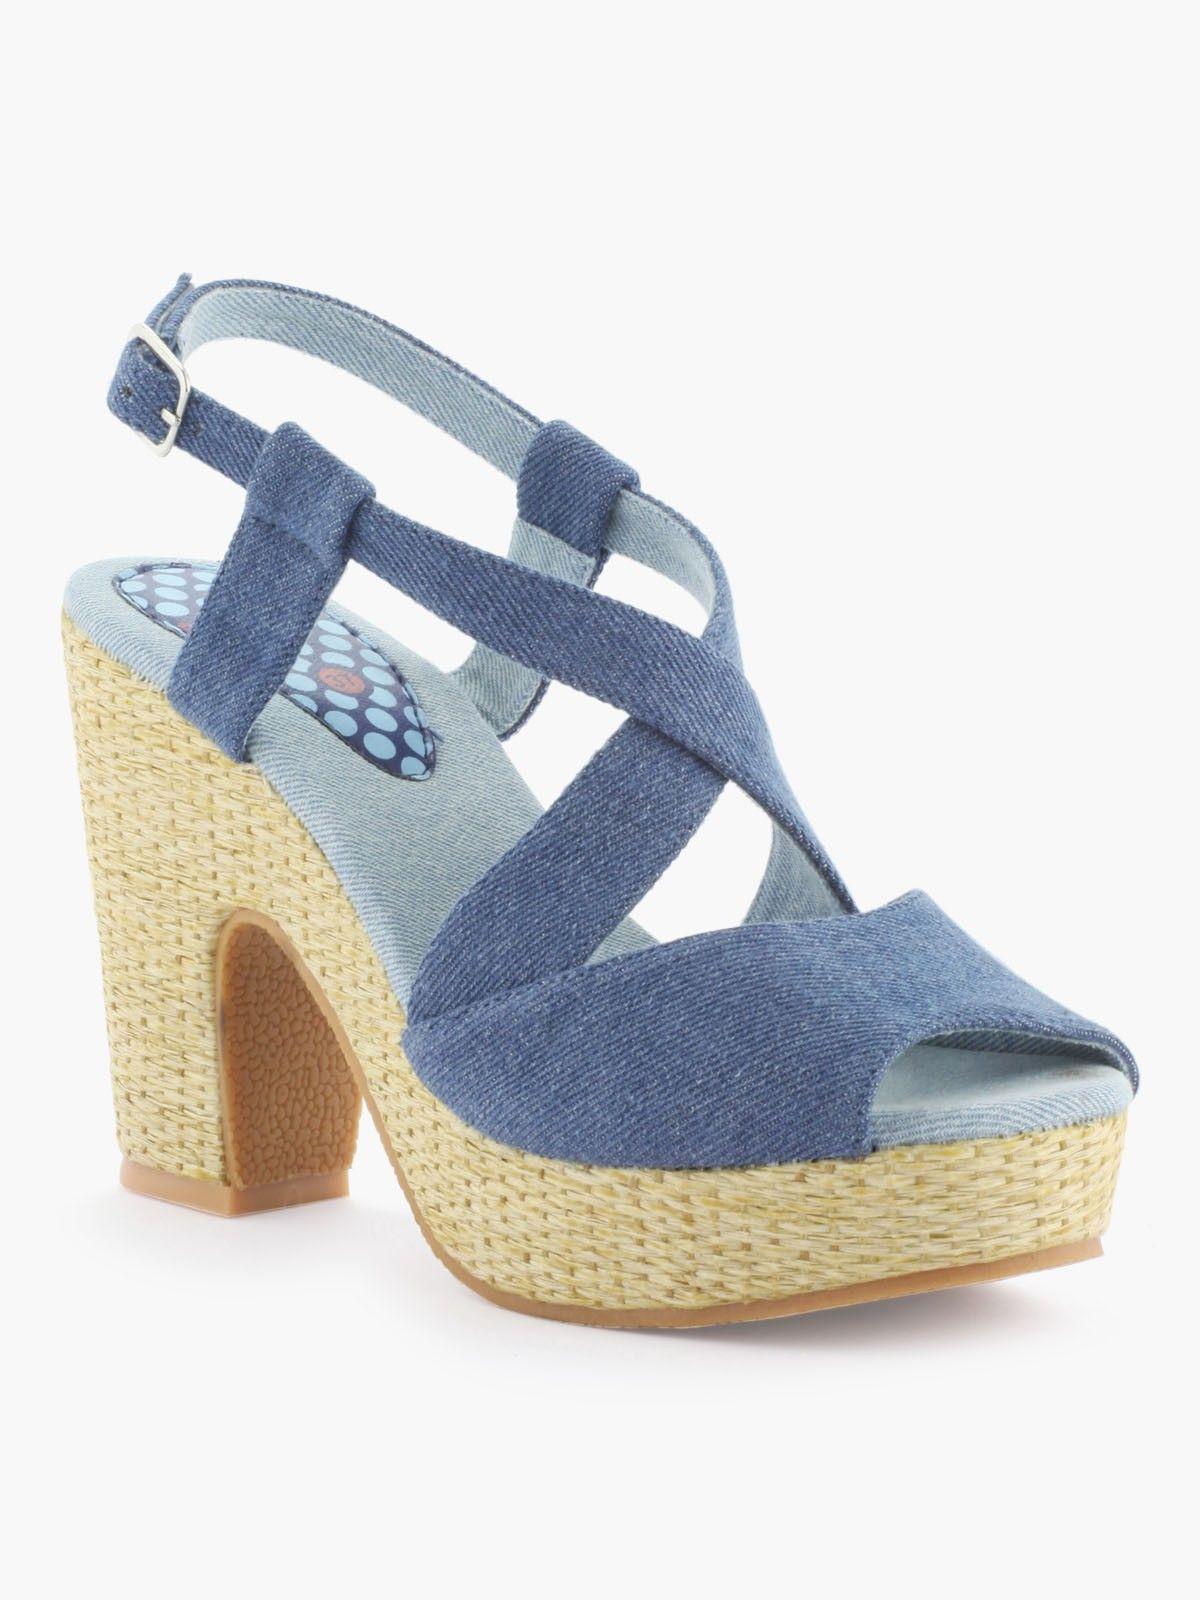 By Nu Chaussures Naf Pieds N Rebodcx La Zpqrz Sandales Halle Pinterest yYIf7vb6g